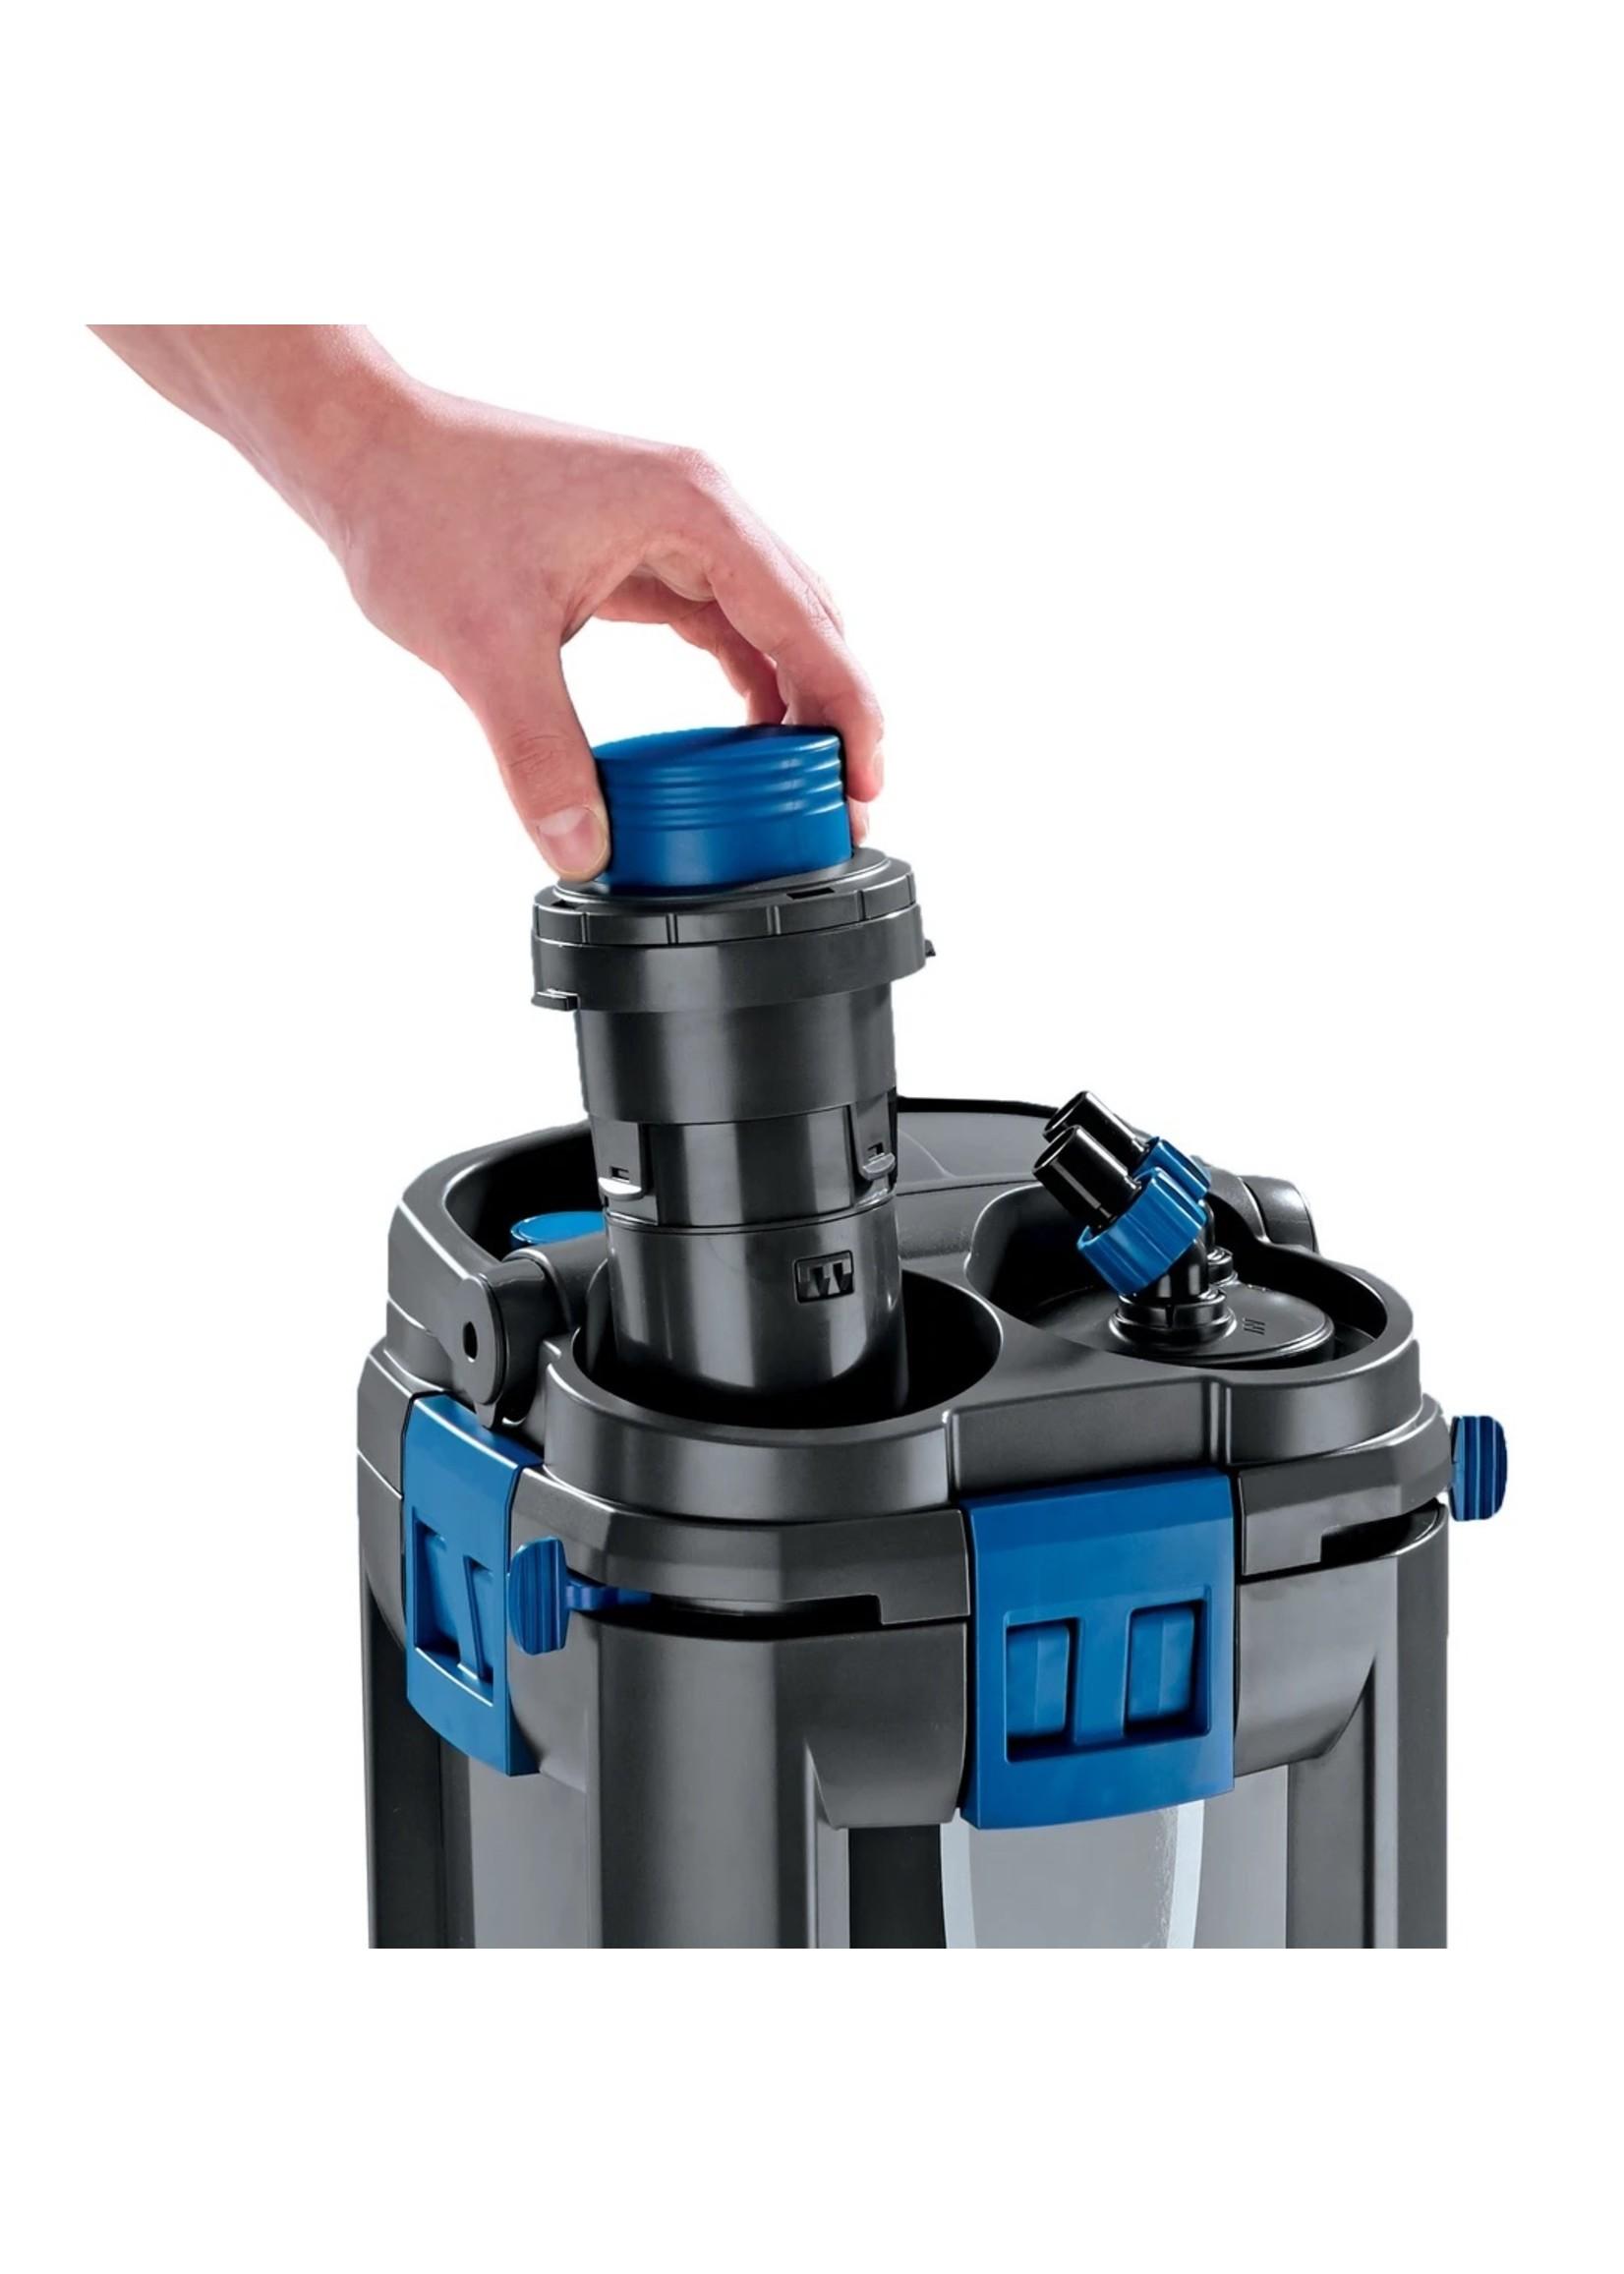 OASE OASE BioMaster 350 External Filter